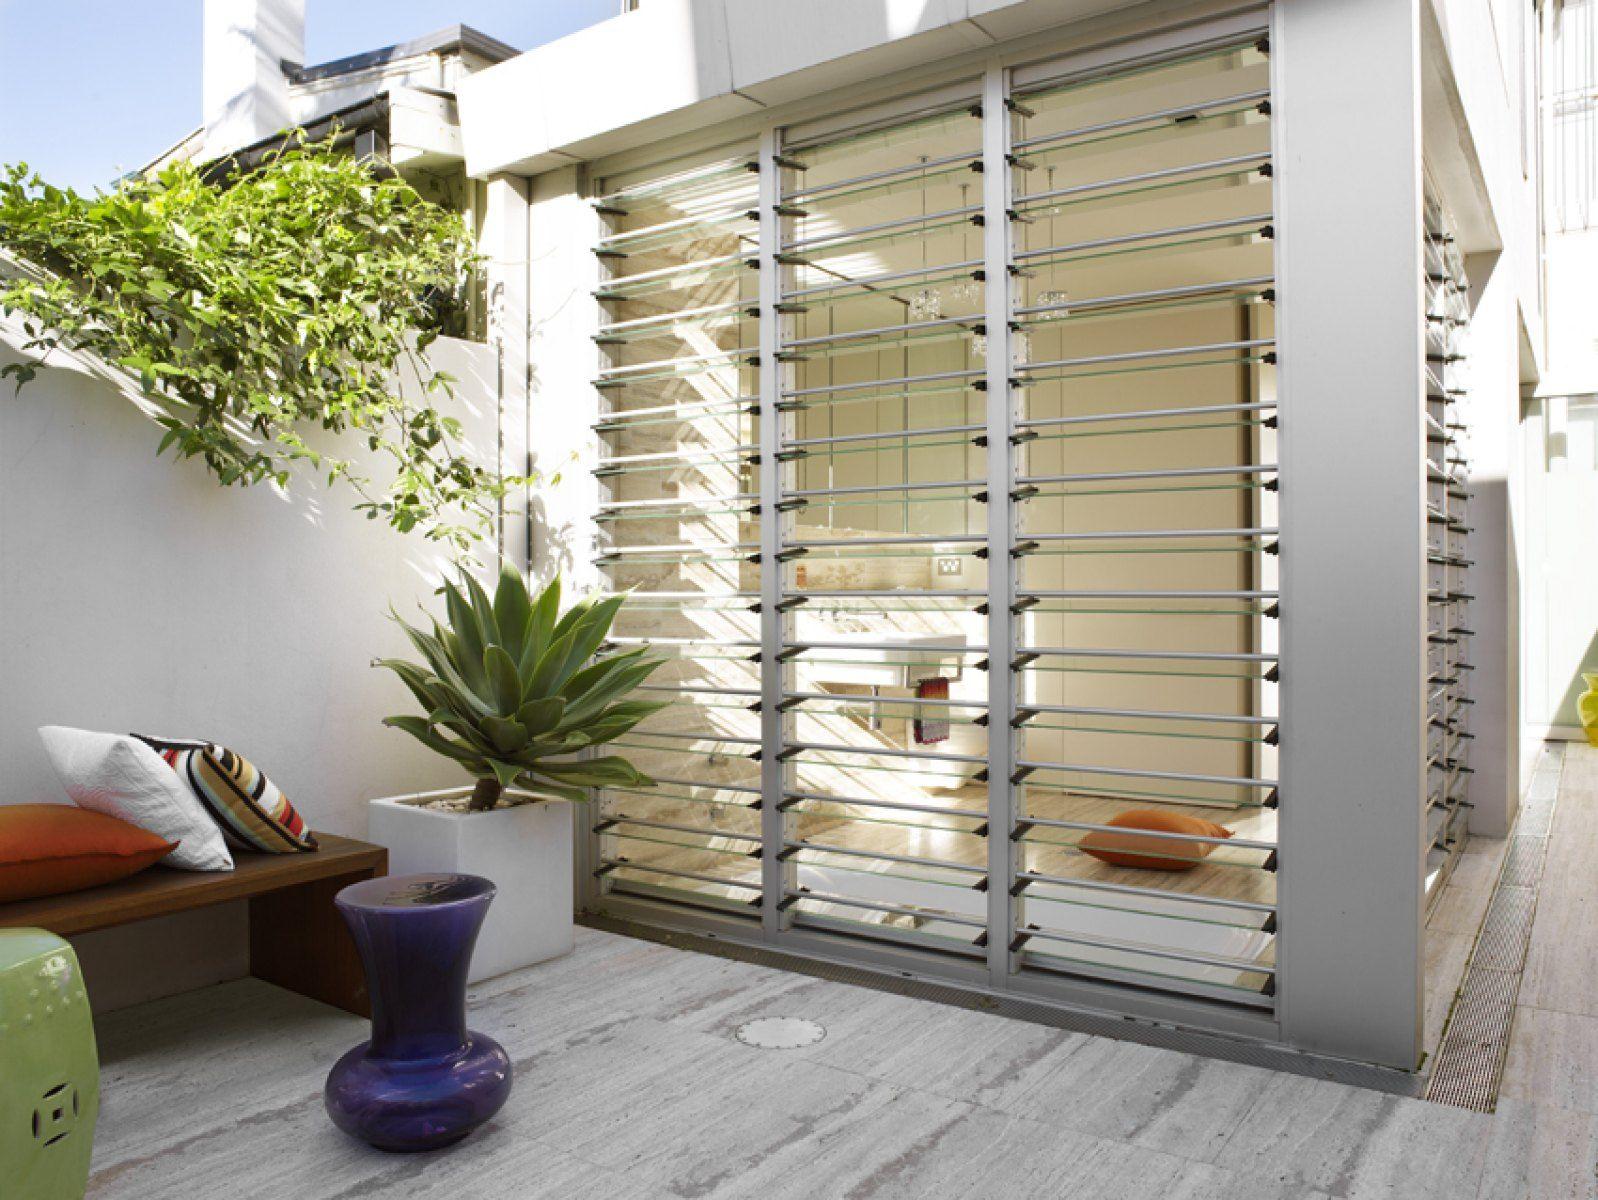 Greg natale sydney based architects and interior